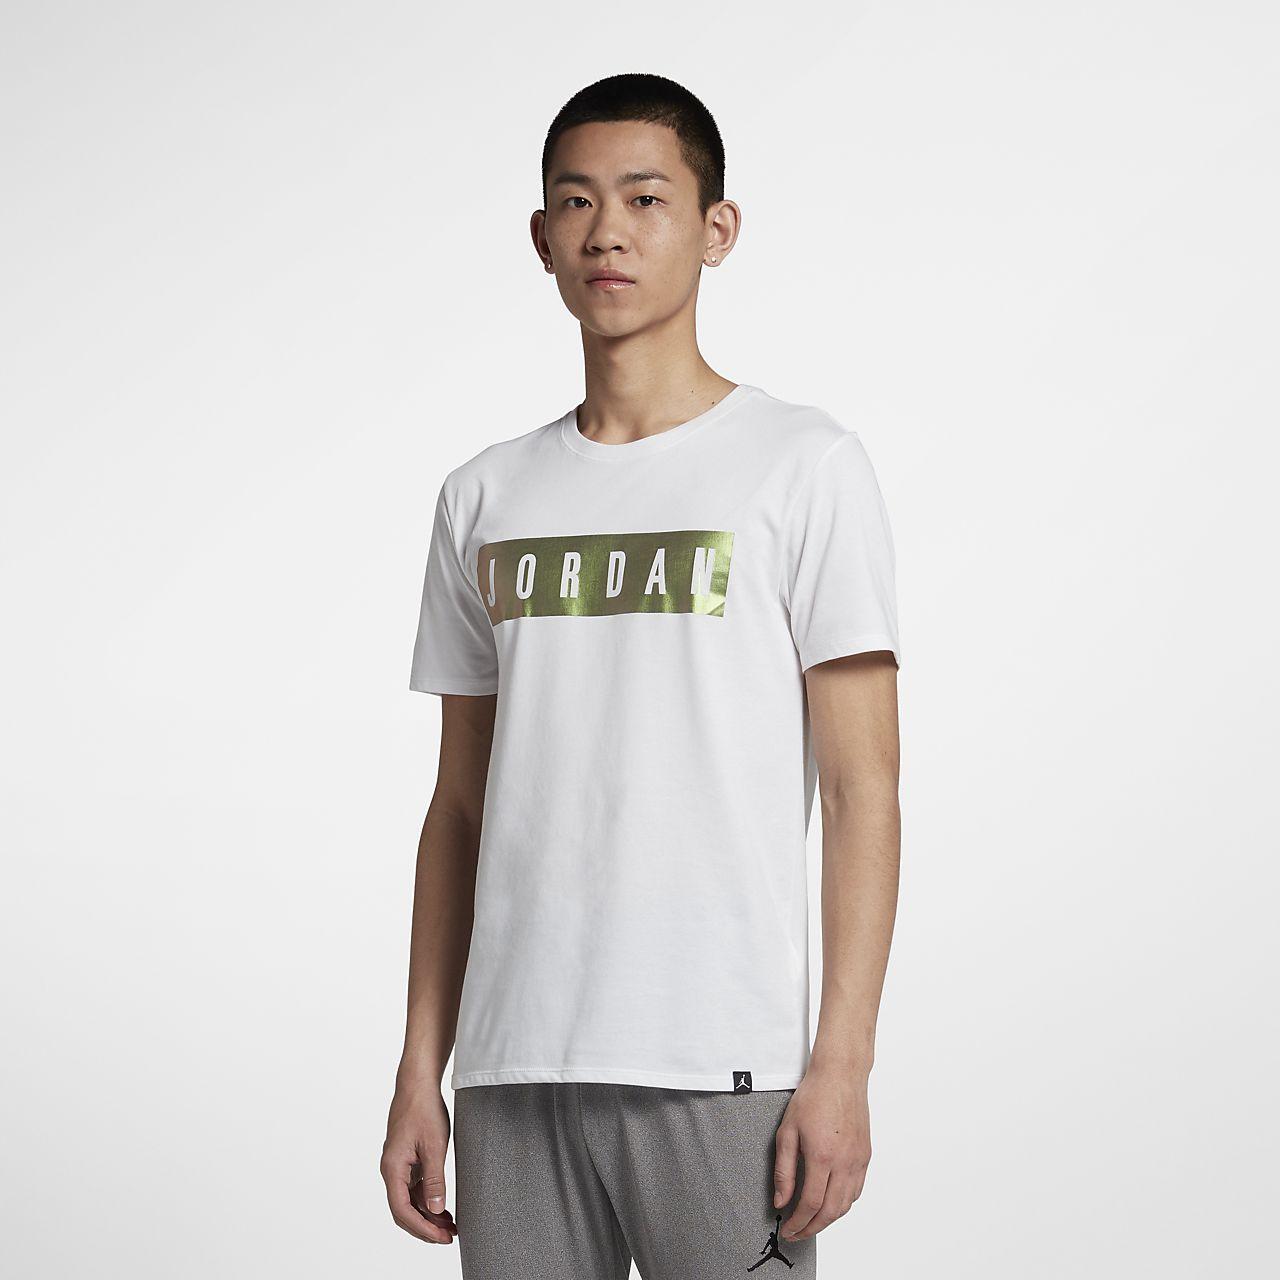 Jordan 男子训练T恤